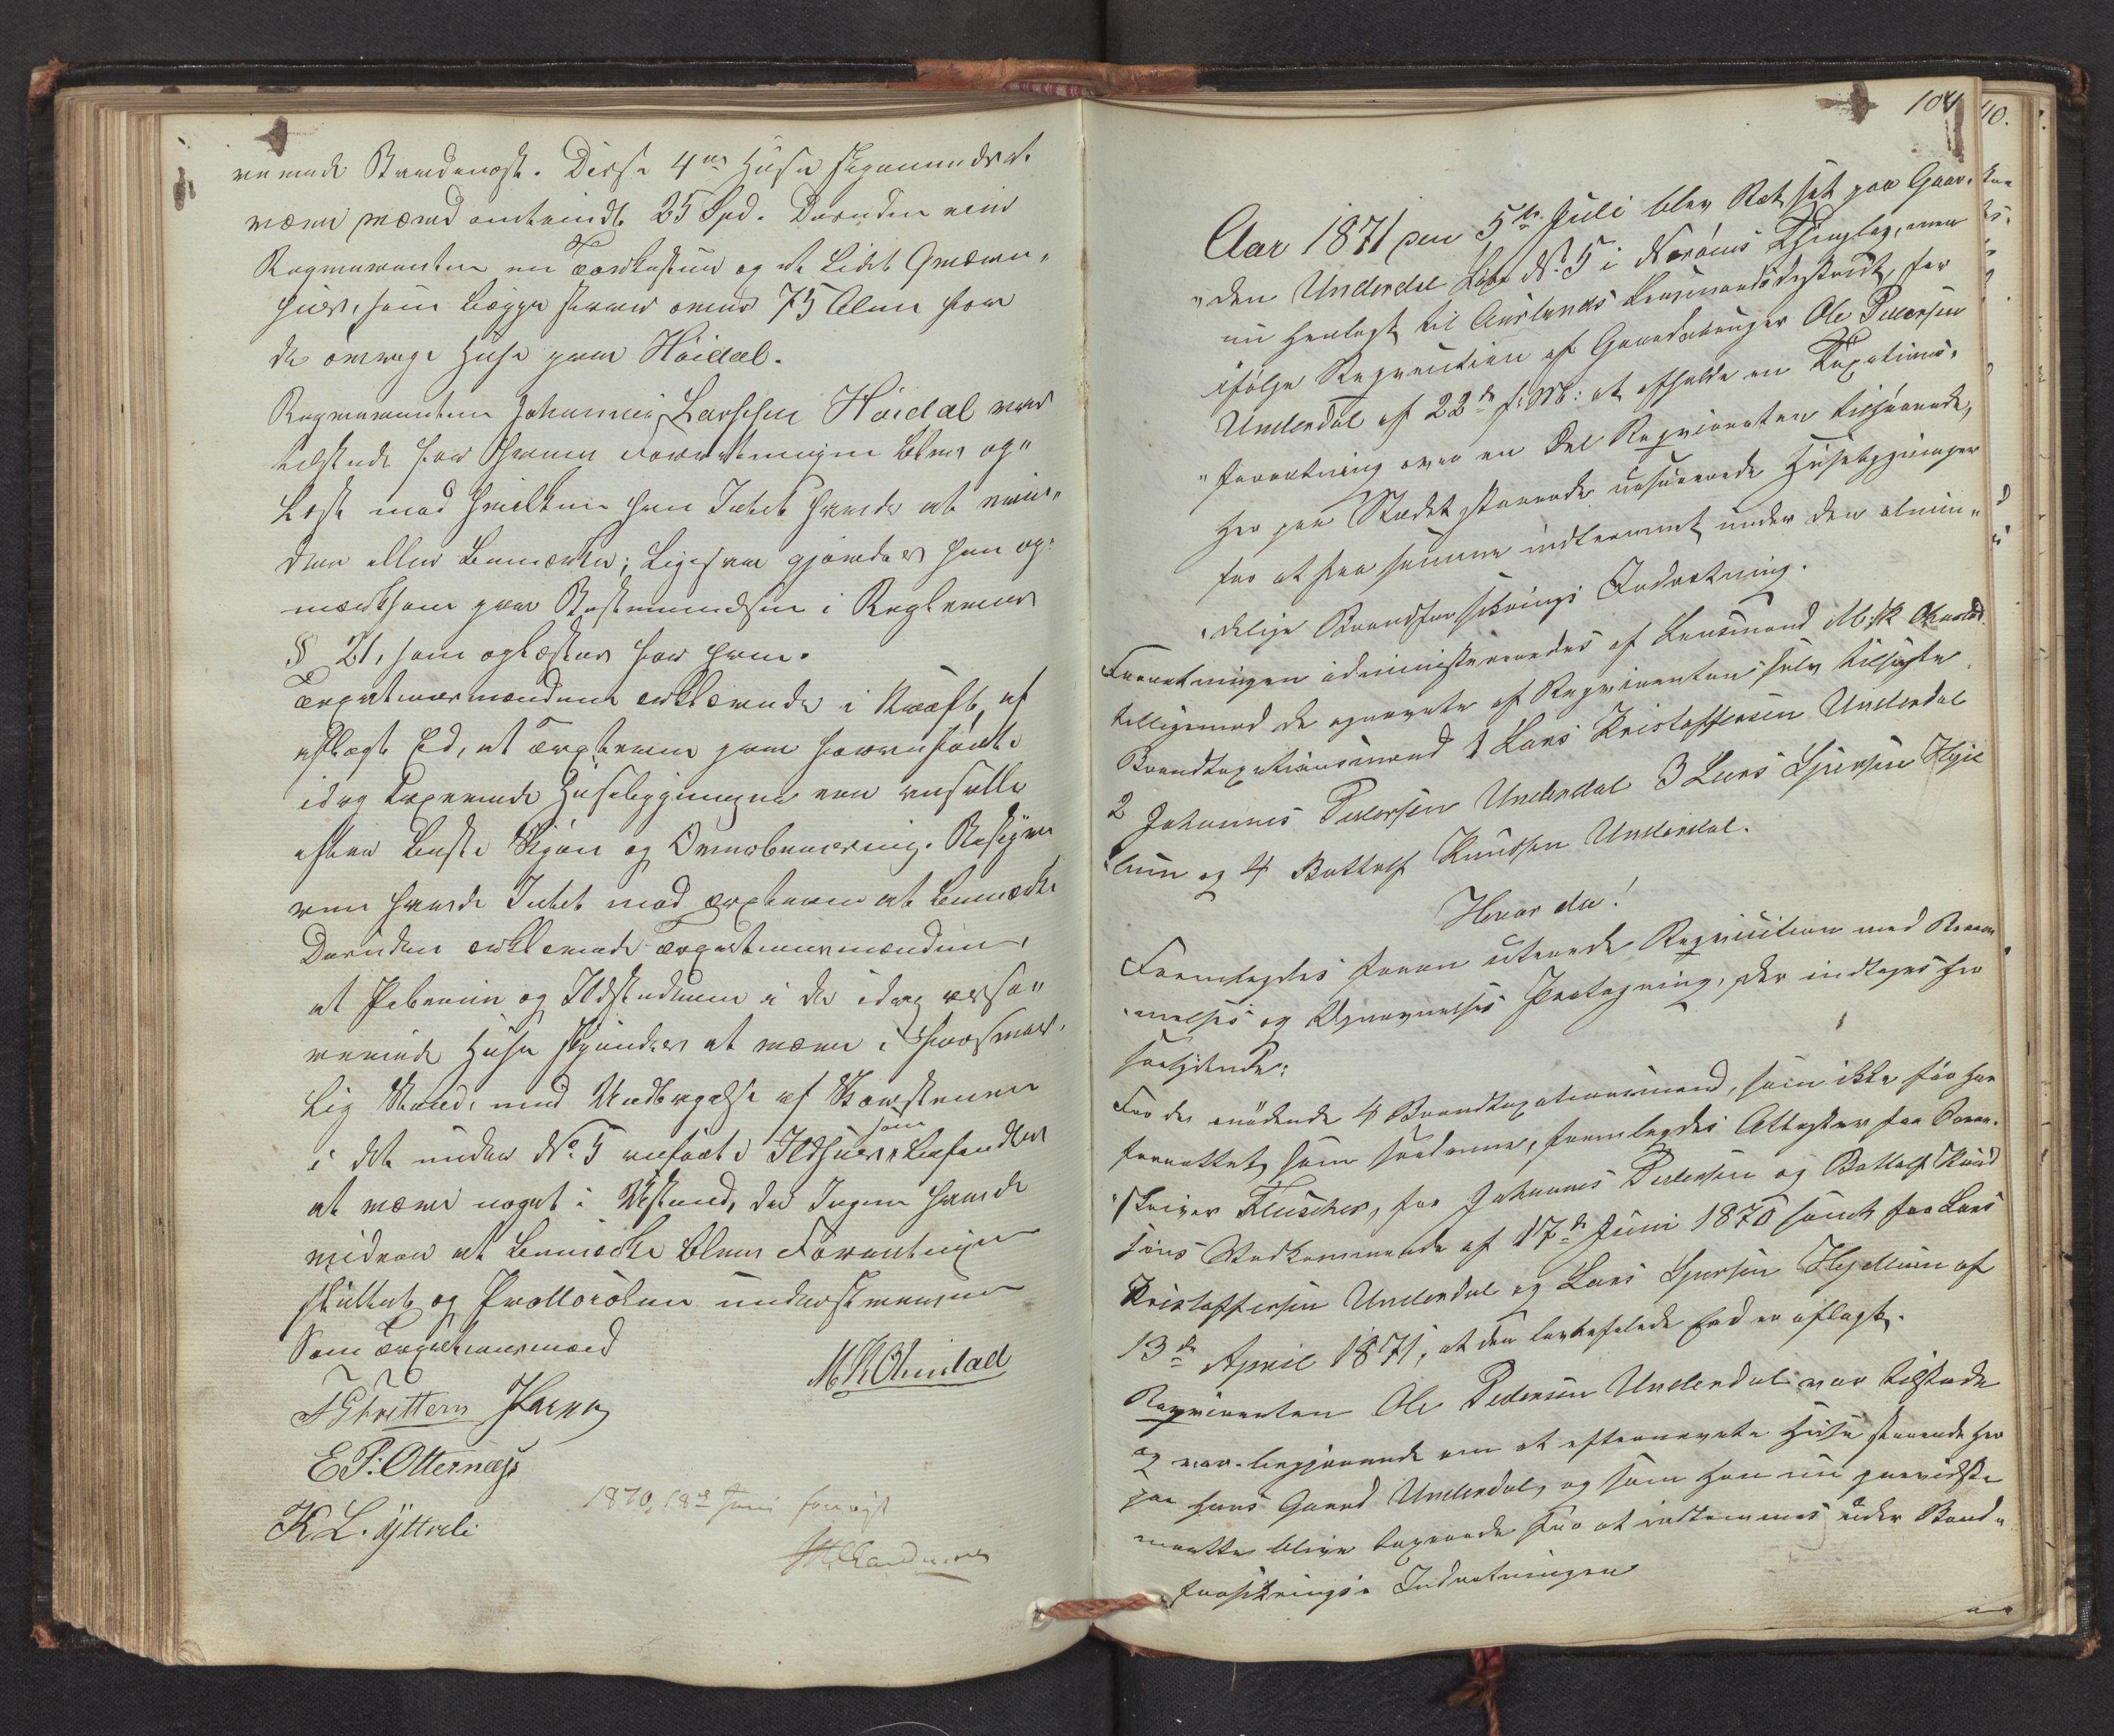 SAB, Lensmannen i Aurland, 0012/L0001: Branntakstprotokoll, 1846-1872, s. 103b-104a